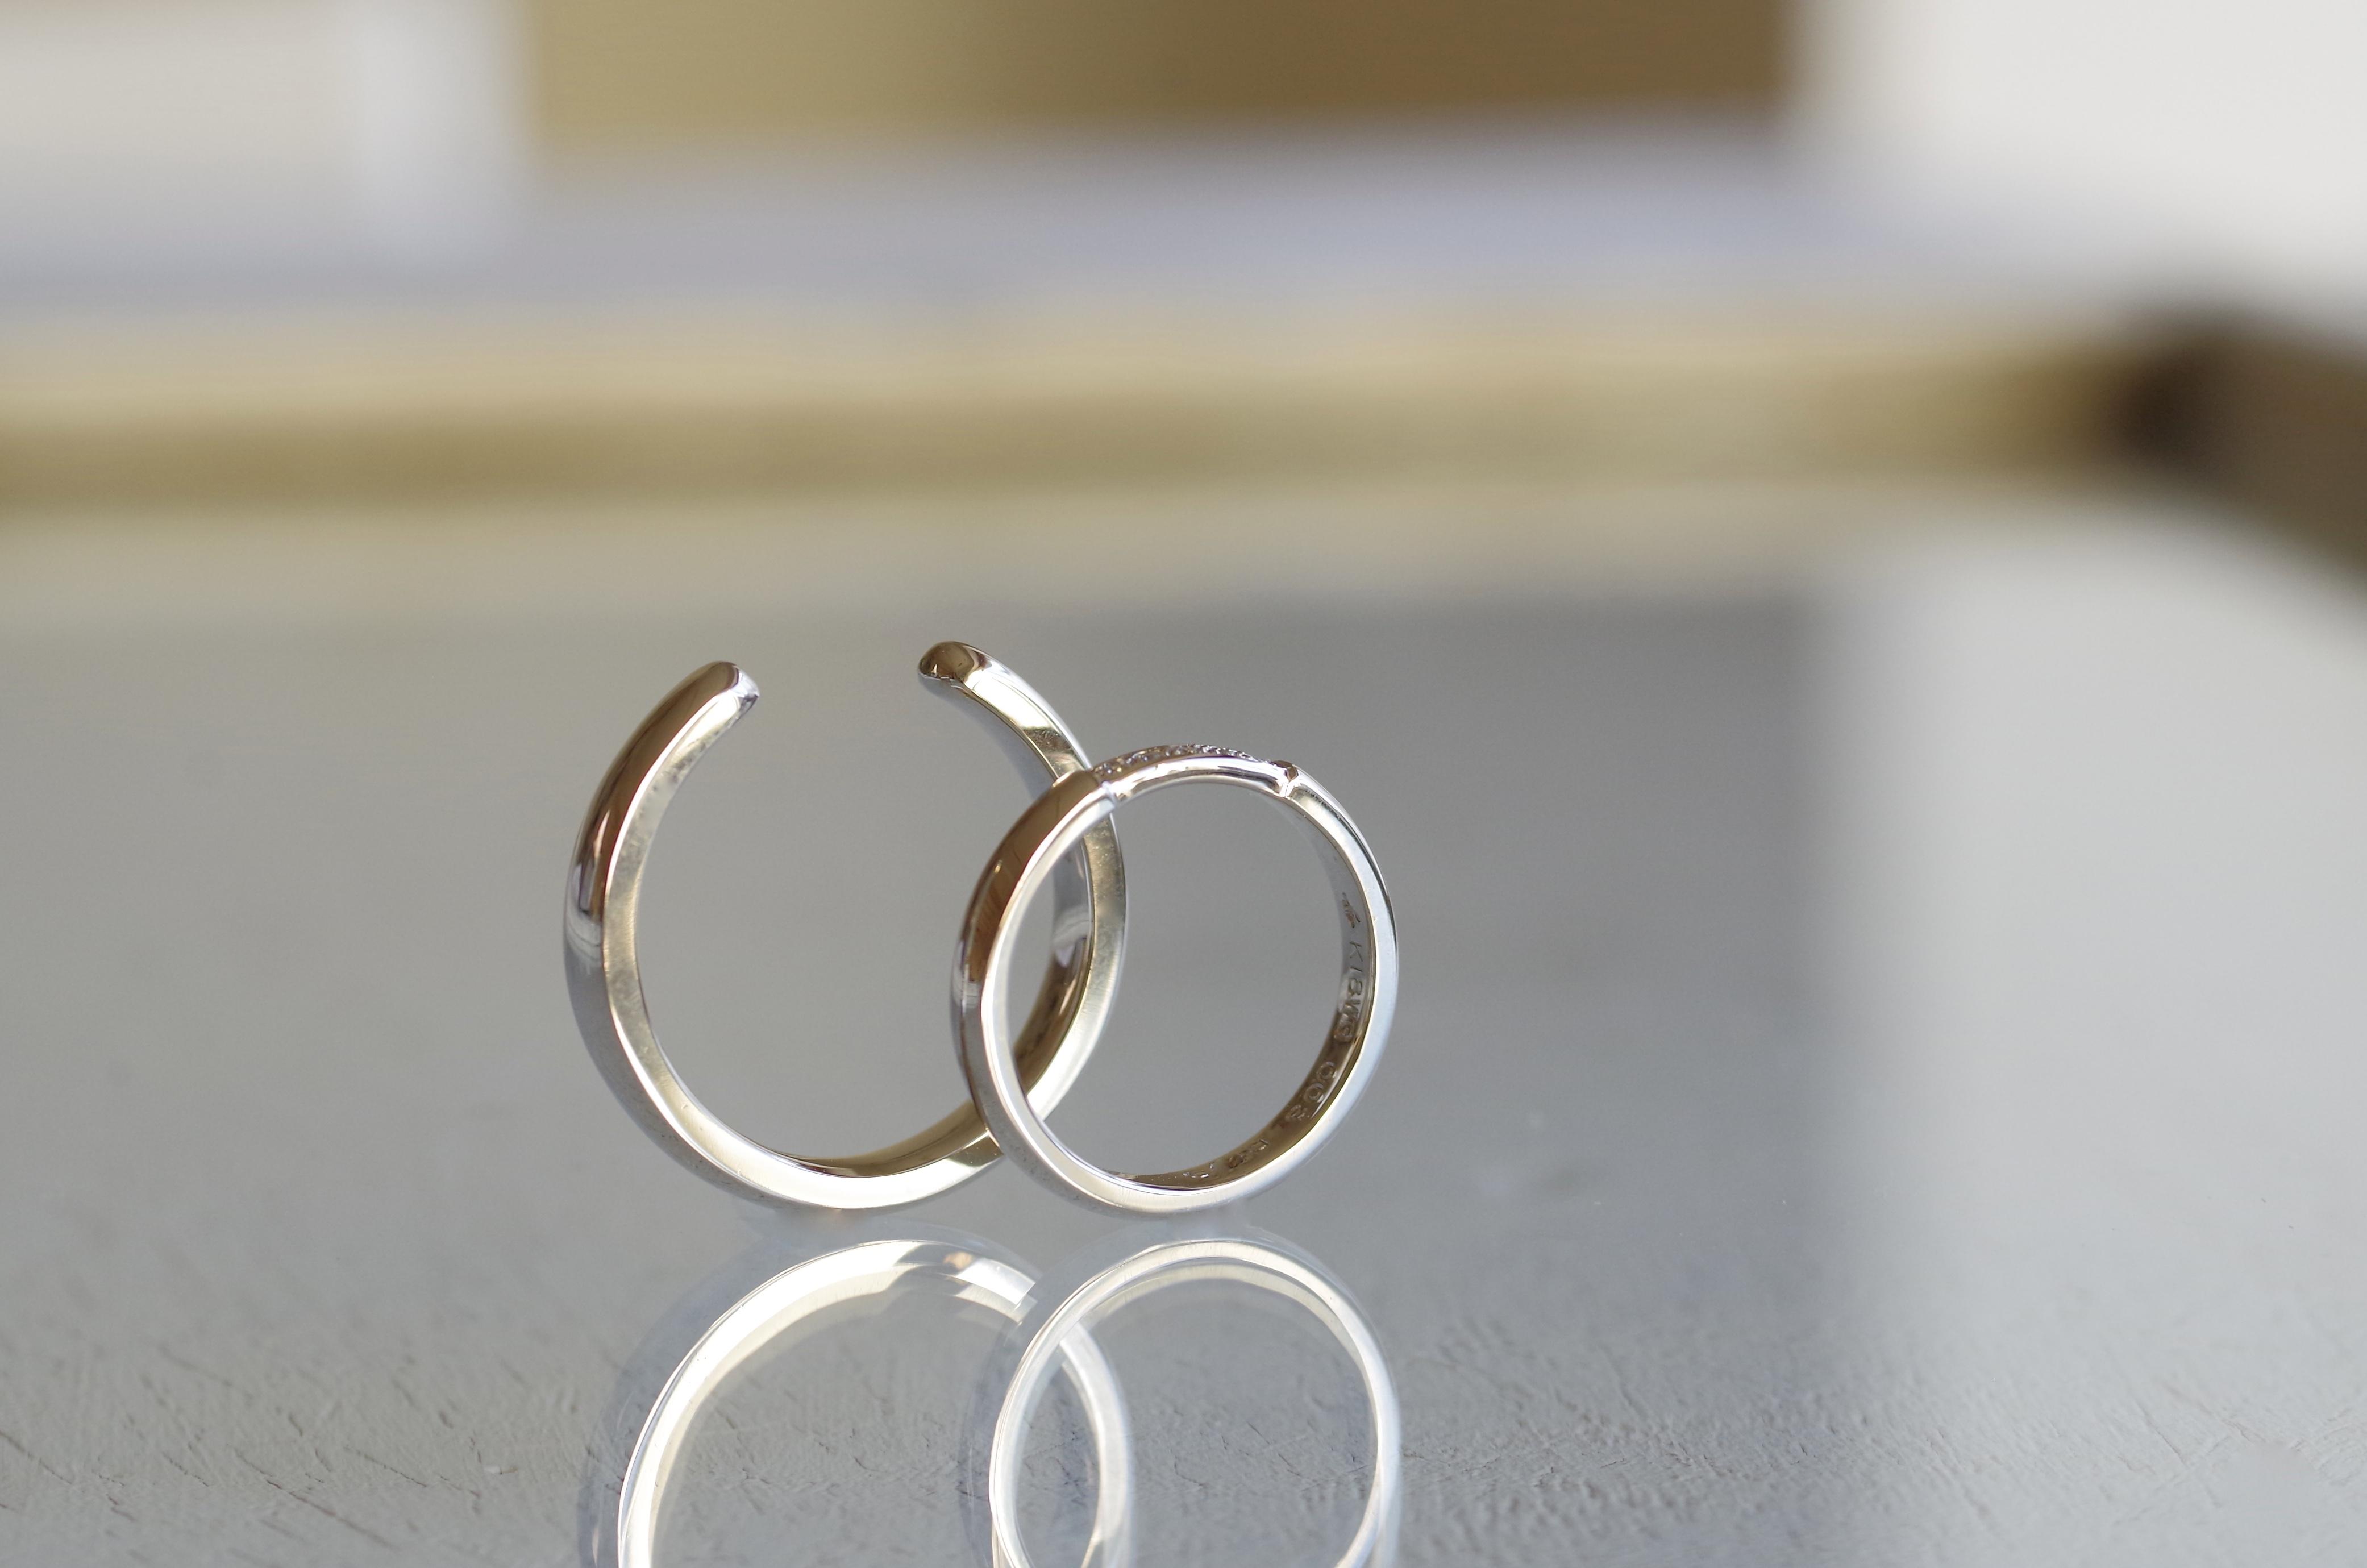 C型の結婚指輪